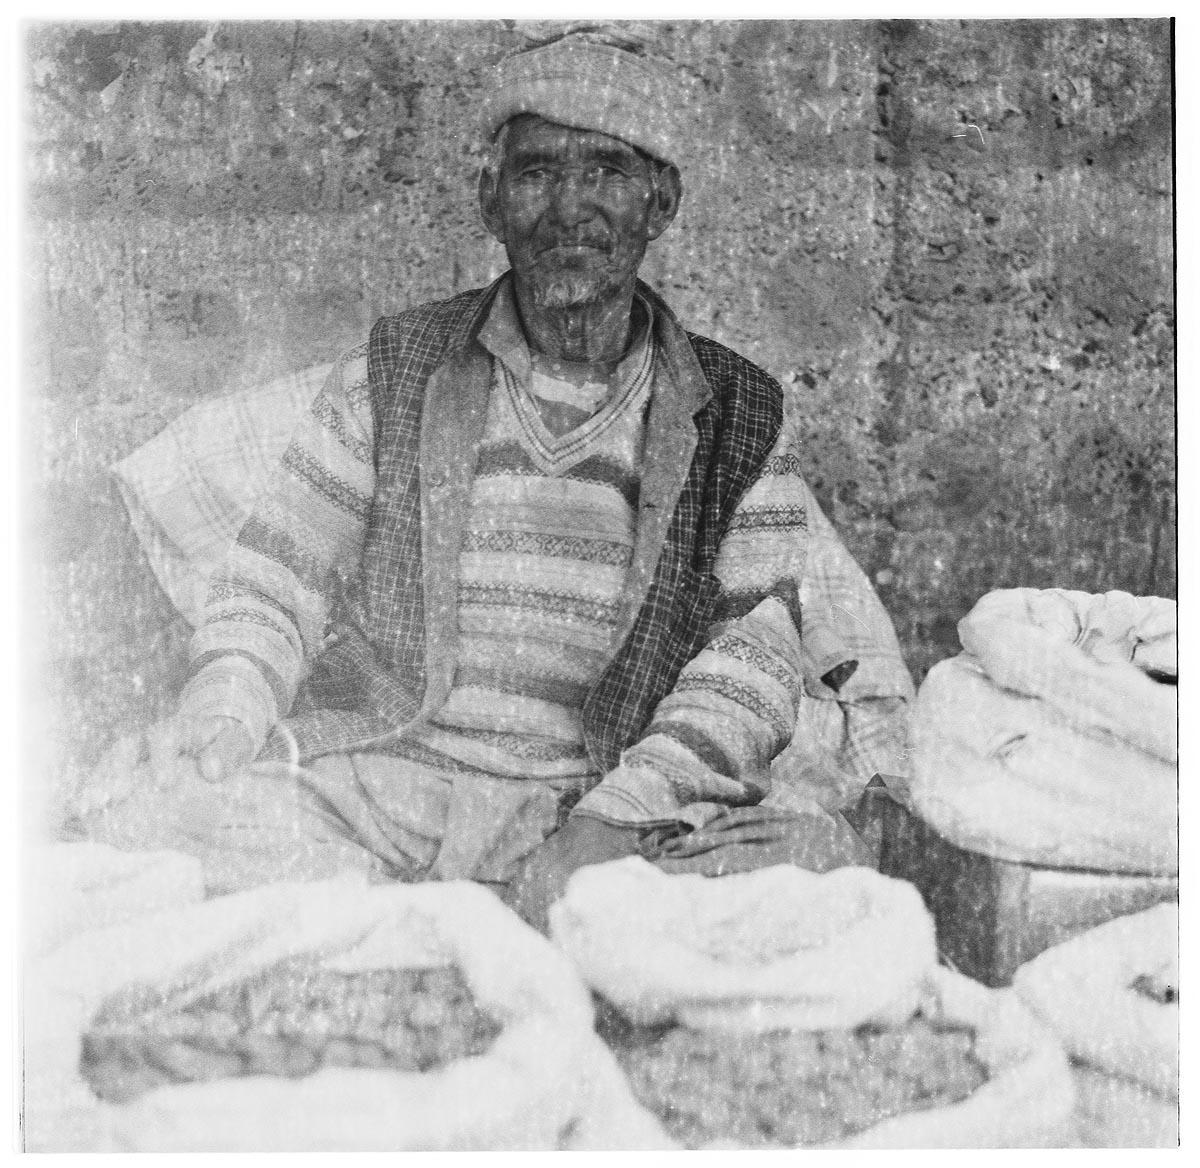 Hasselblad - Analog Ladakh